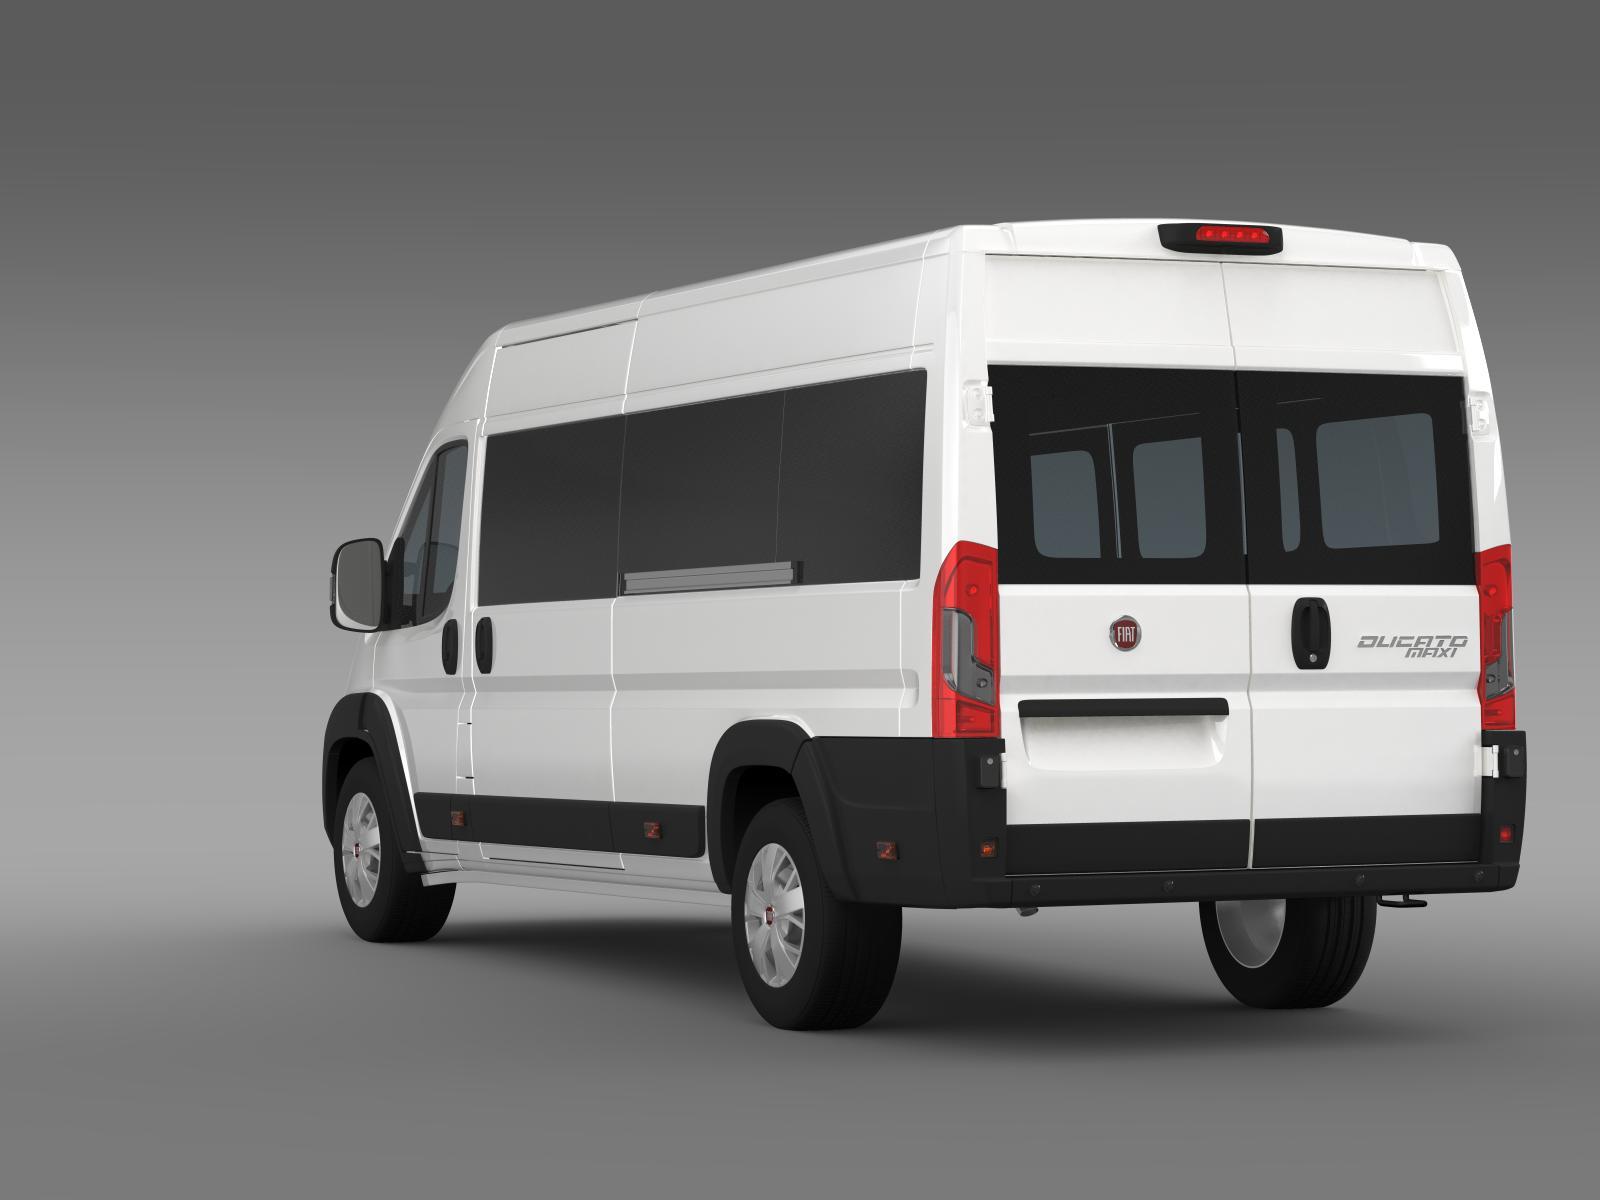 fiat ducato maxi minibus 2015 3d model buy fiat ducato maxi minibus 2015 3d model flatpyramid. Black Bedroom Furniture Sets. Home Design Ideas